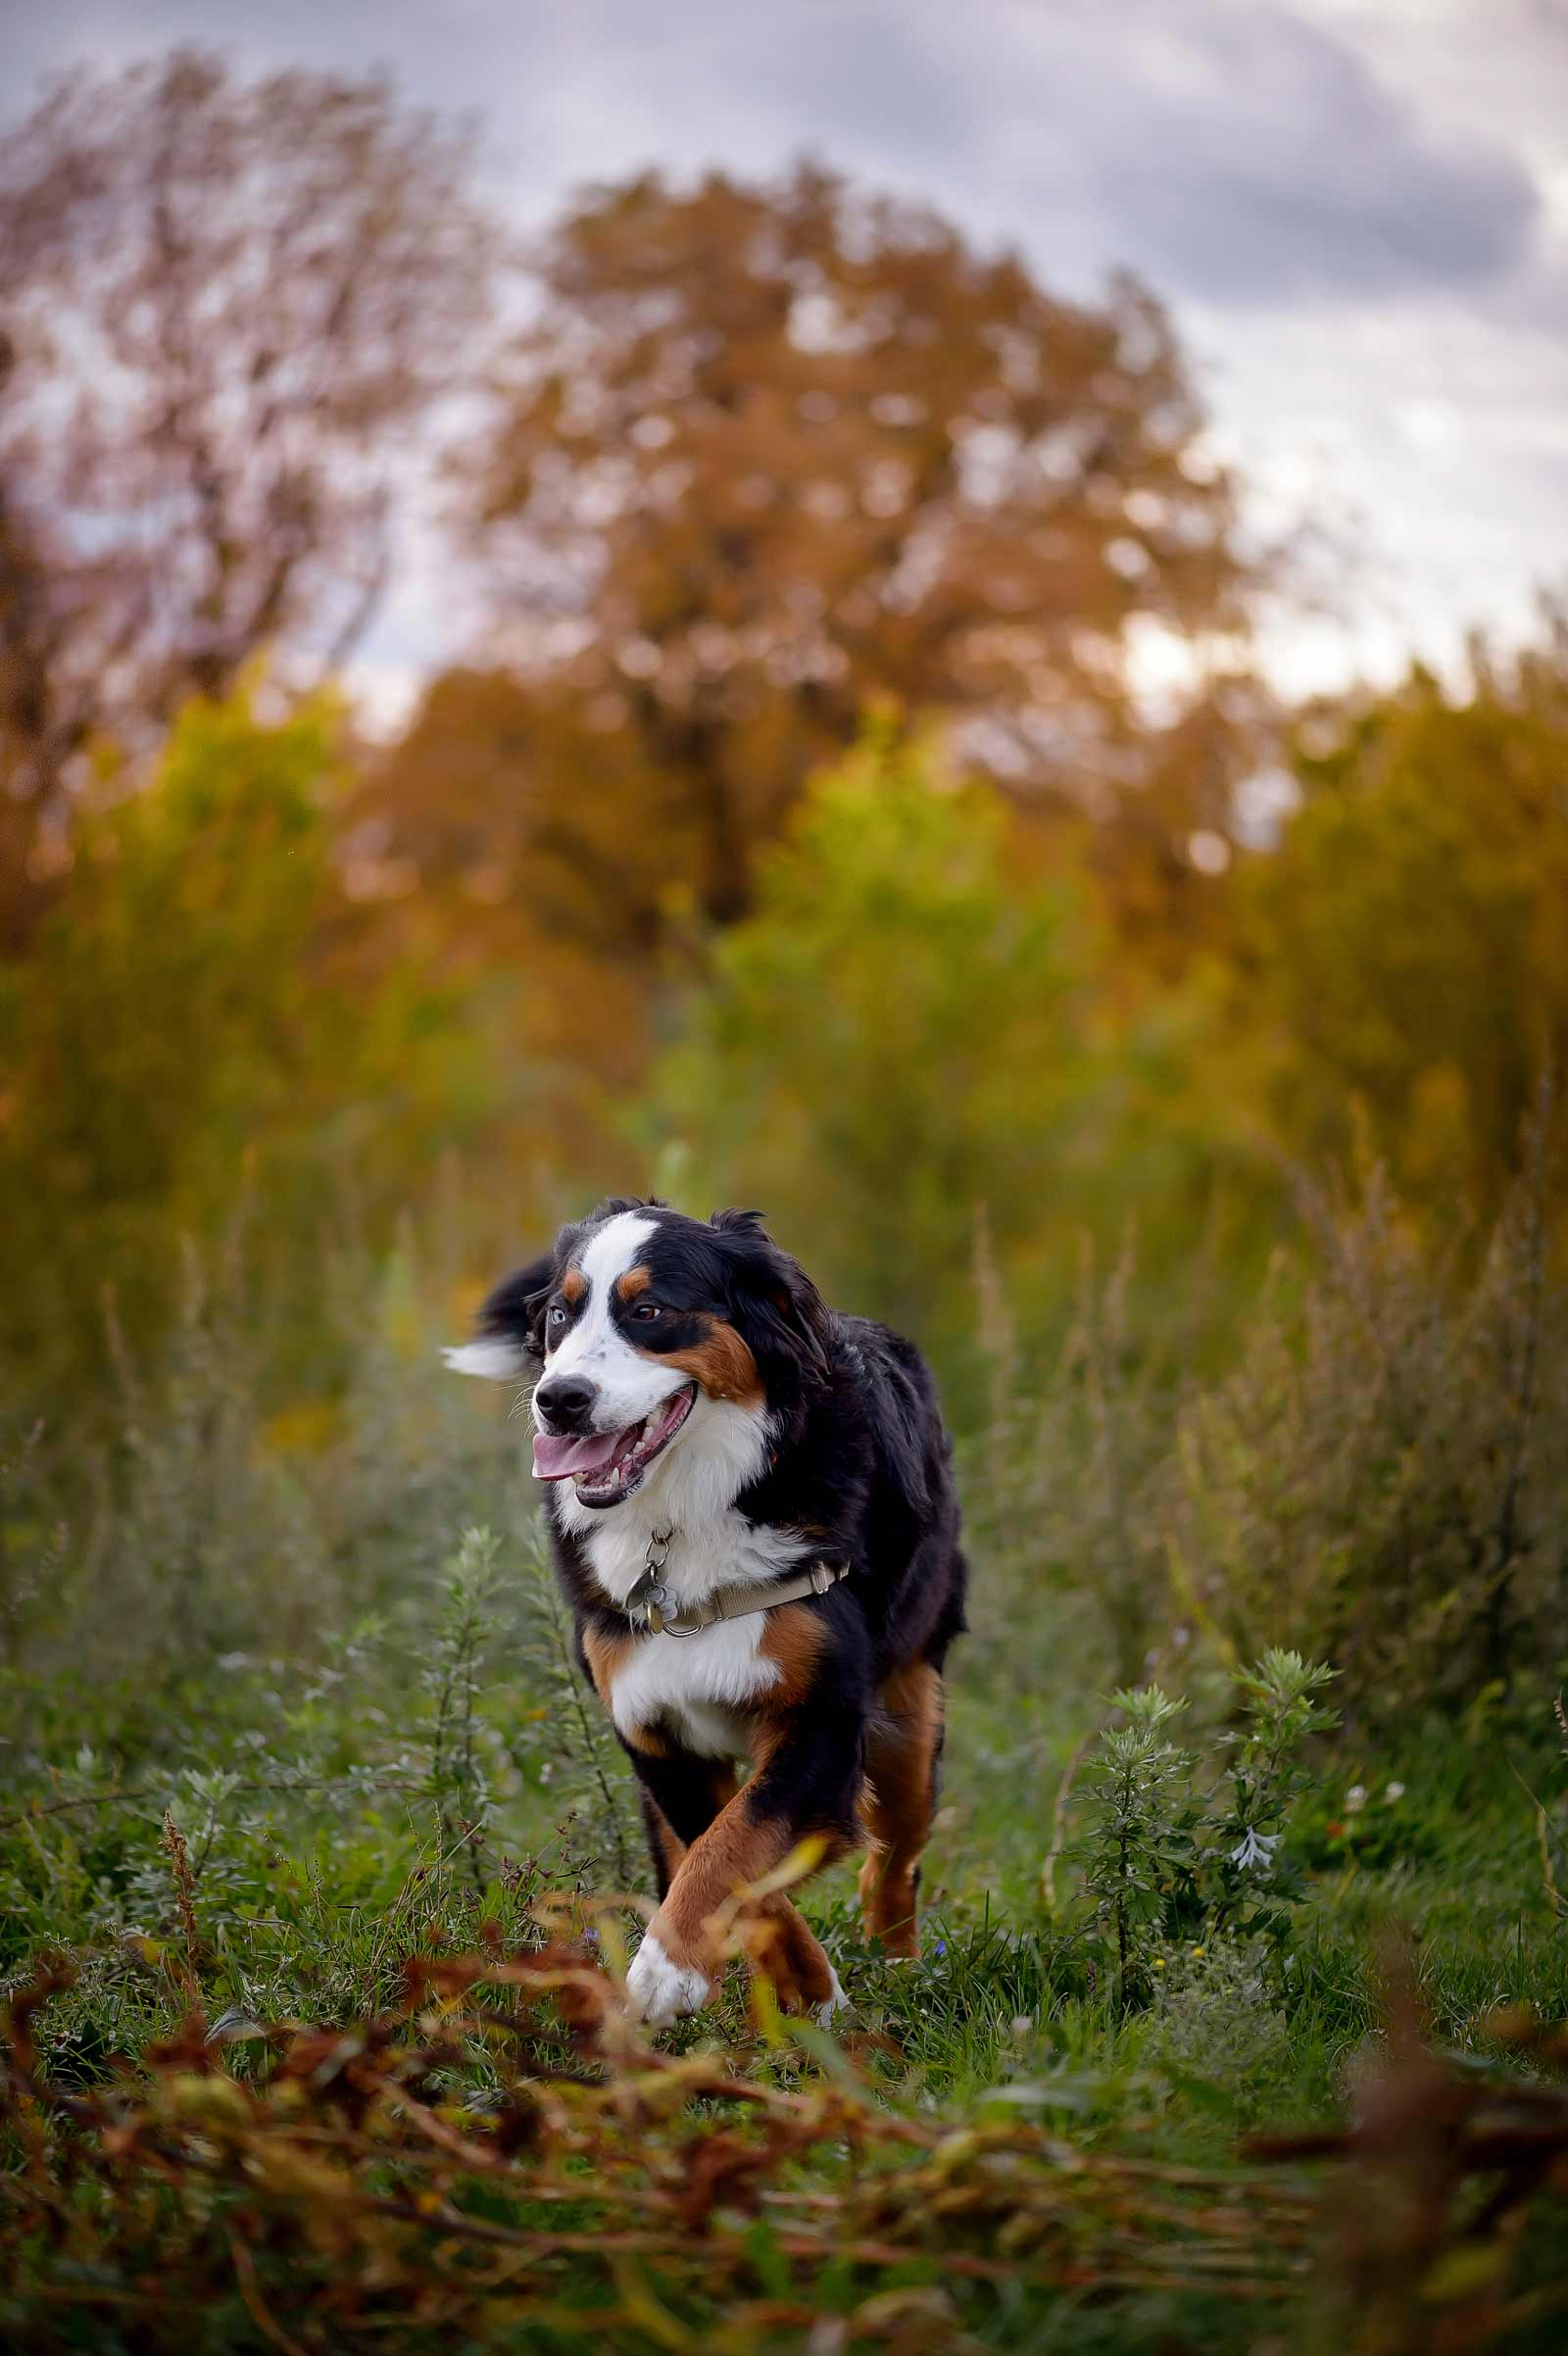 Ottawa Dog Photographer Princess Leia the Bernese mountain dog at Lemieux Island in the fall running